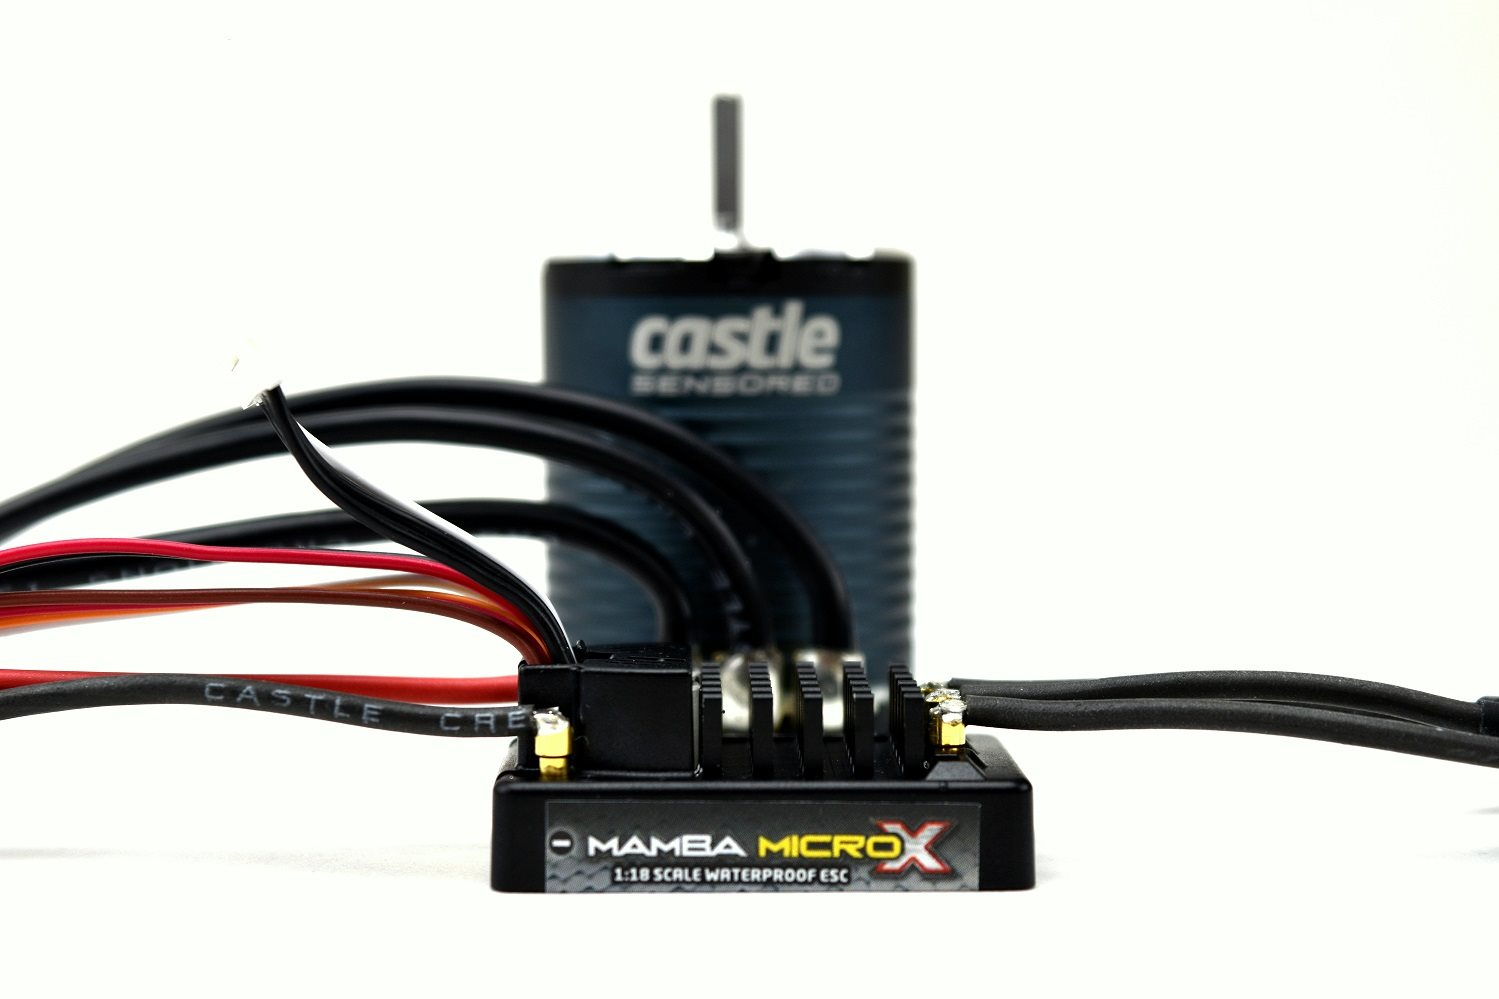 Castle Creations Mamba Micro X Esc (12.6V), W/ 1406 -2280Kv Sensored Brushless Mo